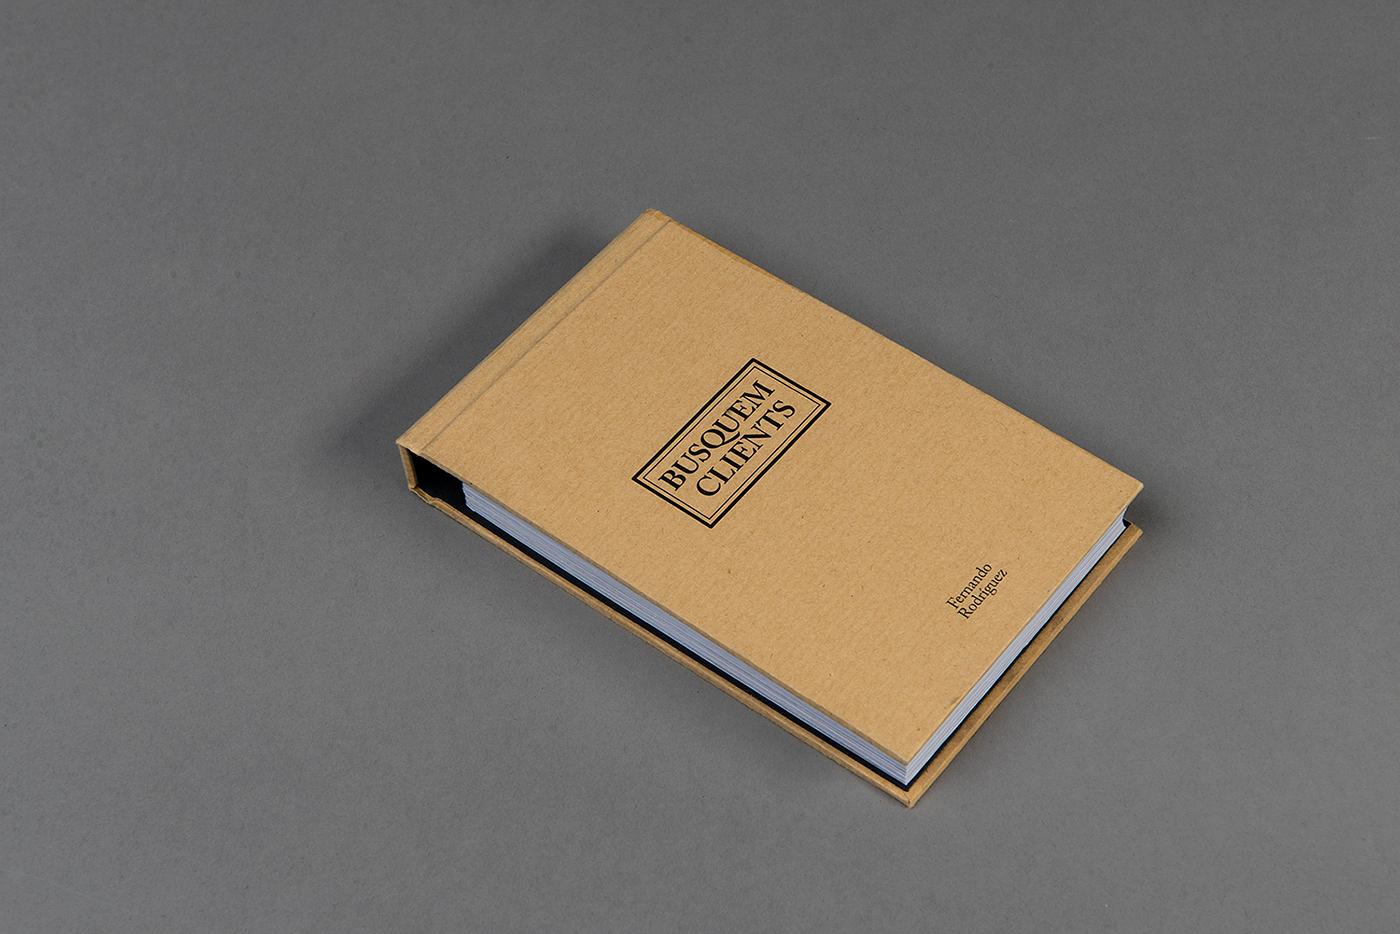 libro book phoyography editorial libreta camarero   craft